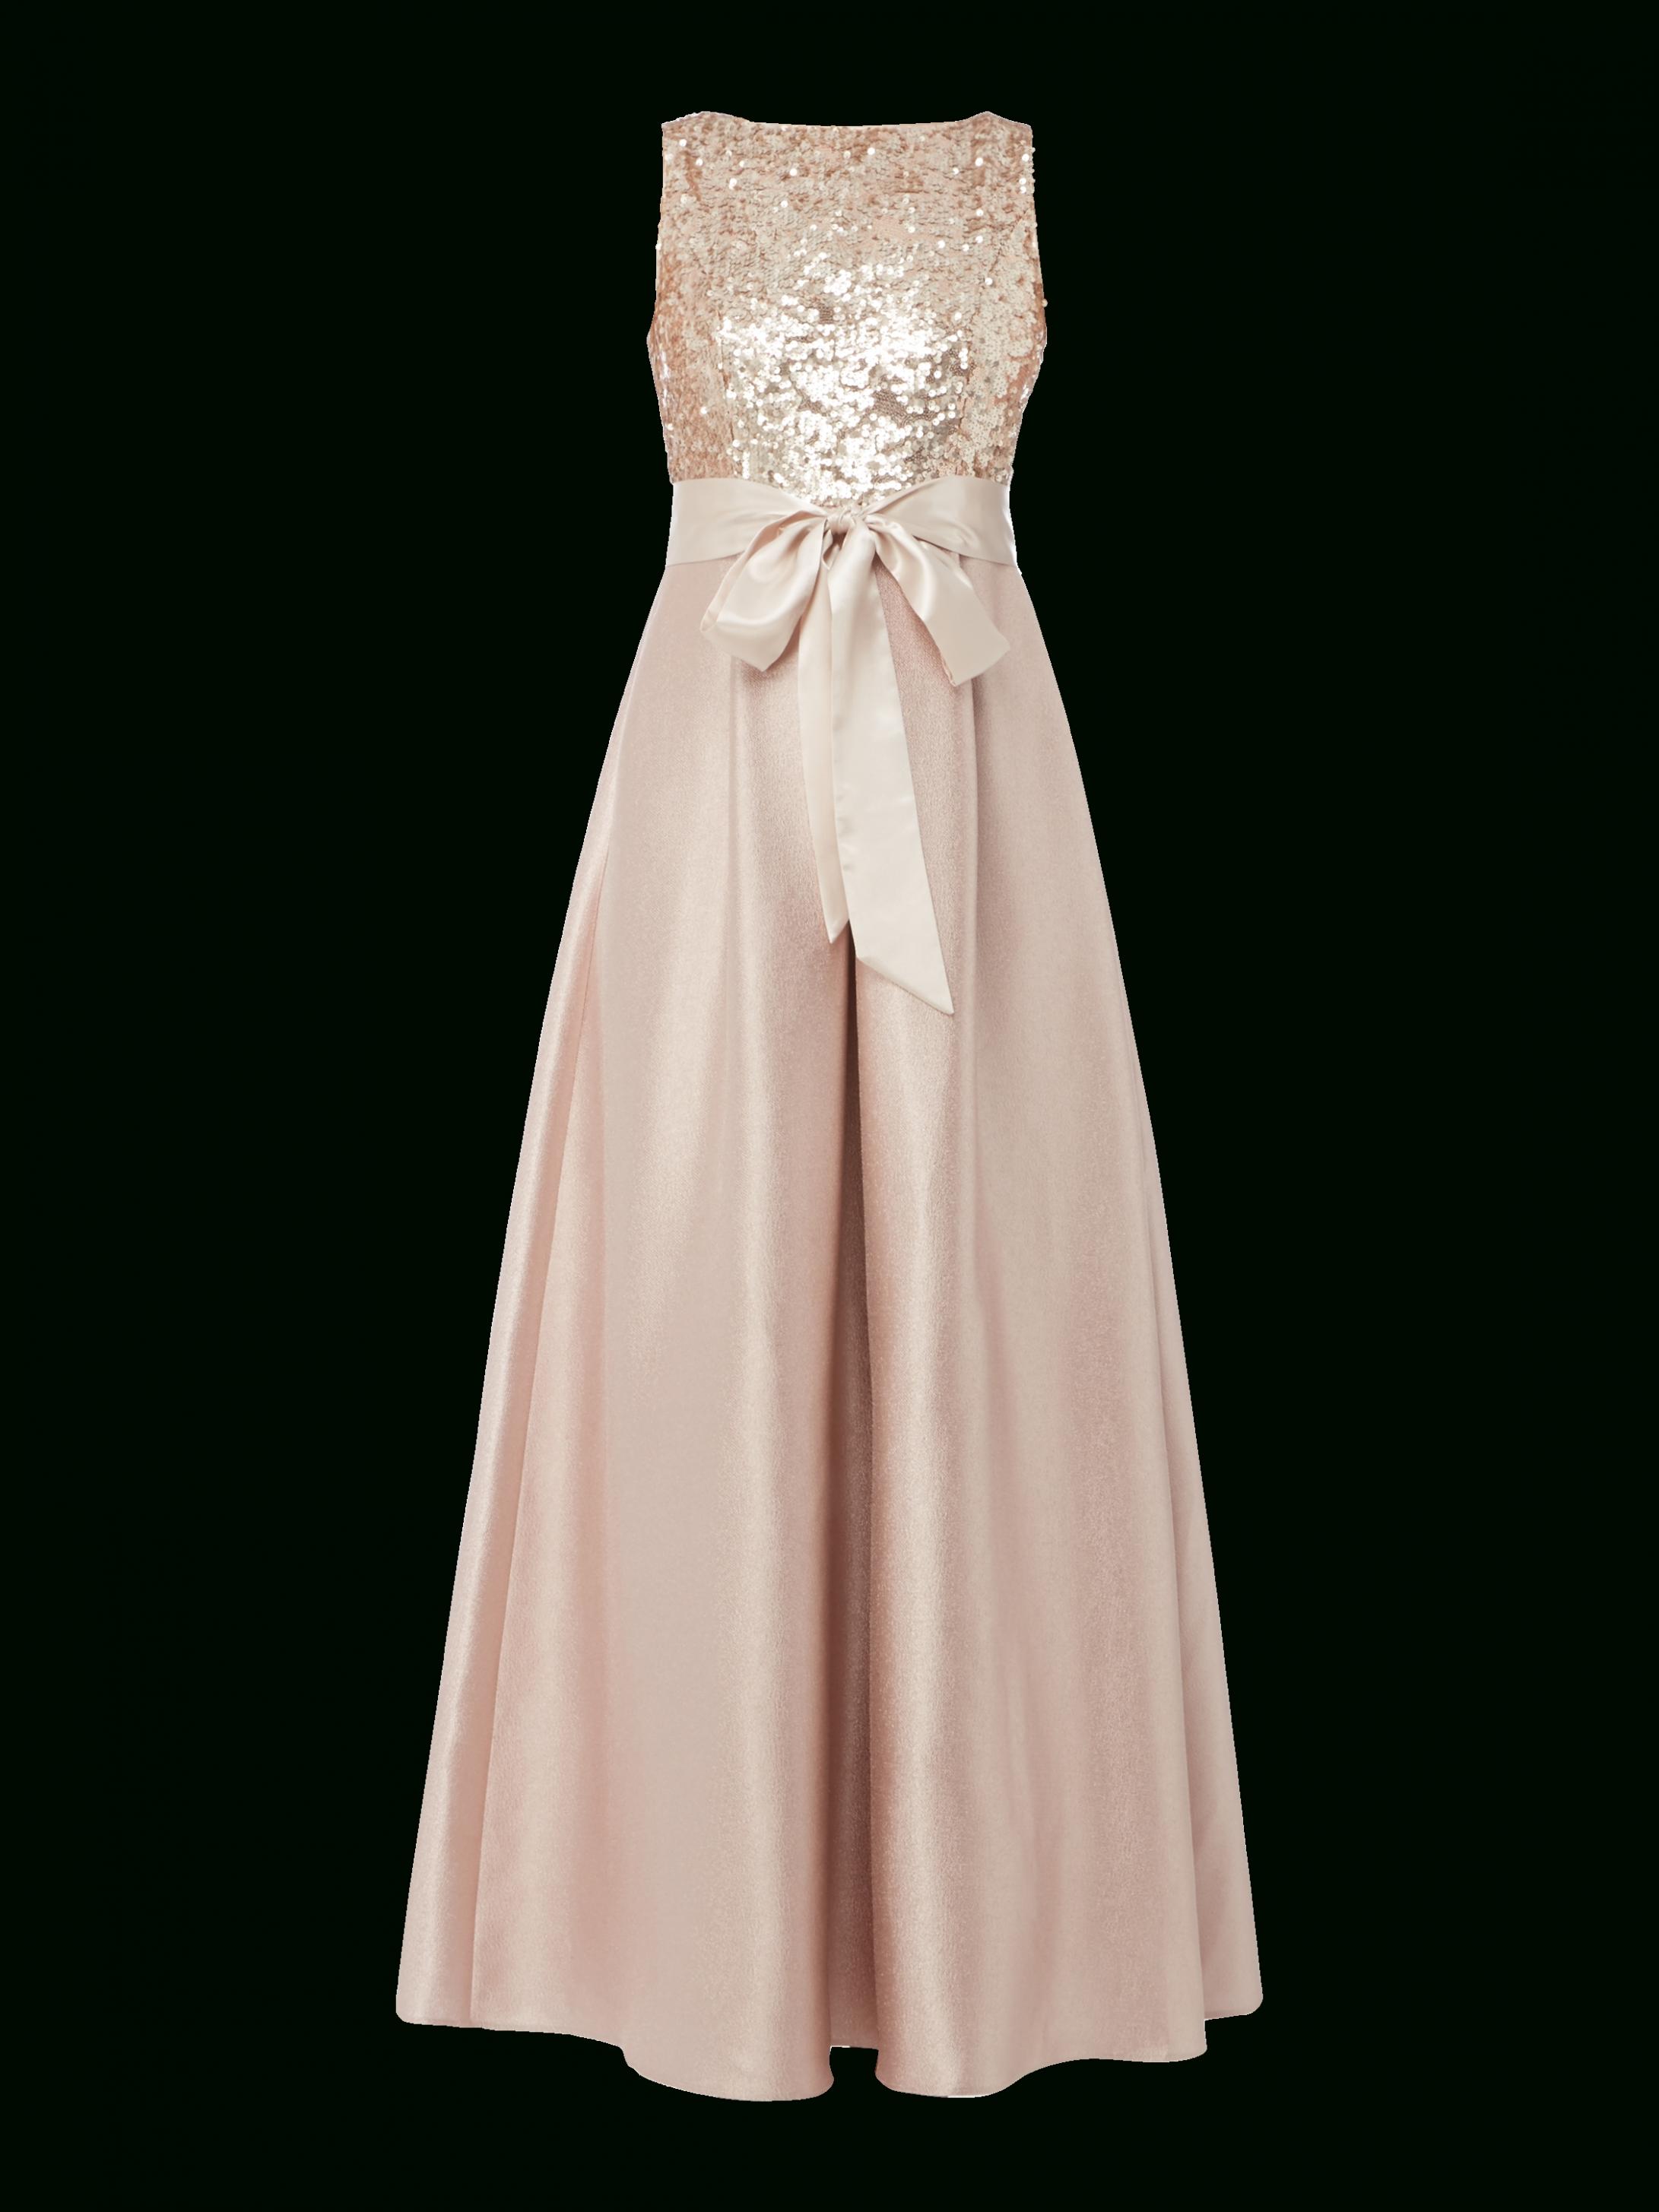 12 Festkleider Gunstig In 2020 Abendkleid Kleid Rose Elegante Brautjungfernkleider